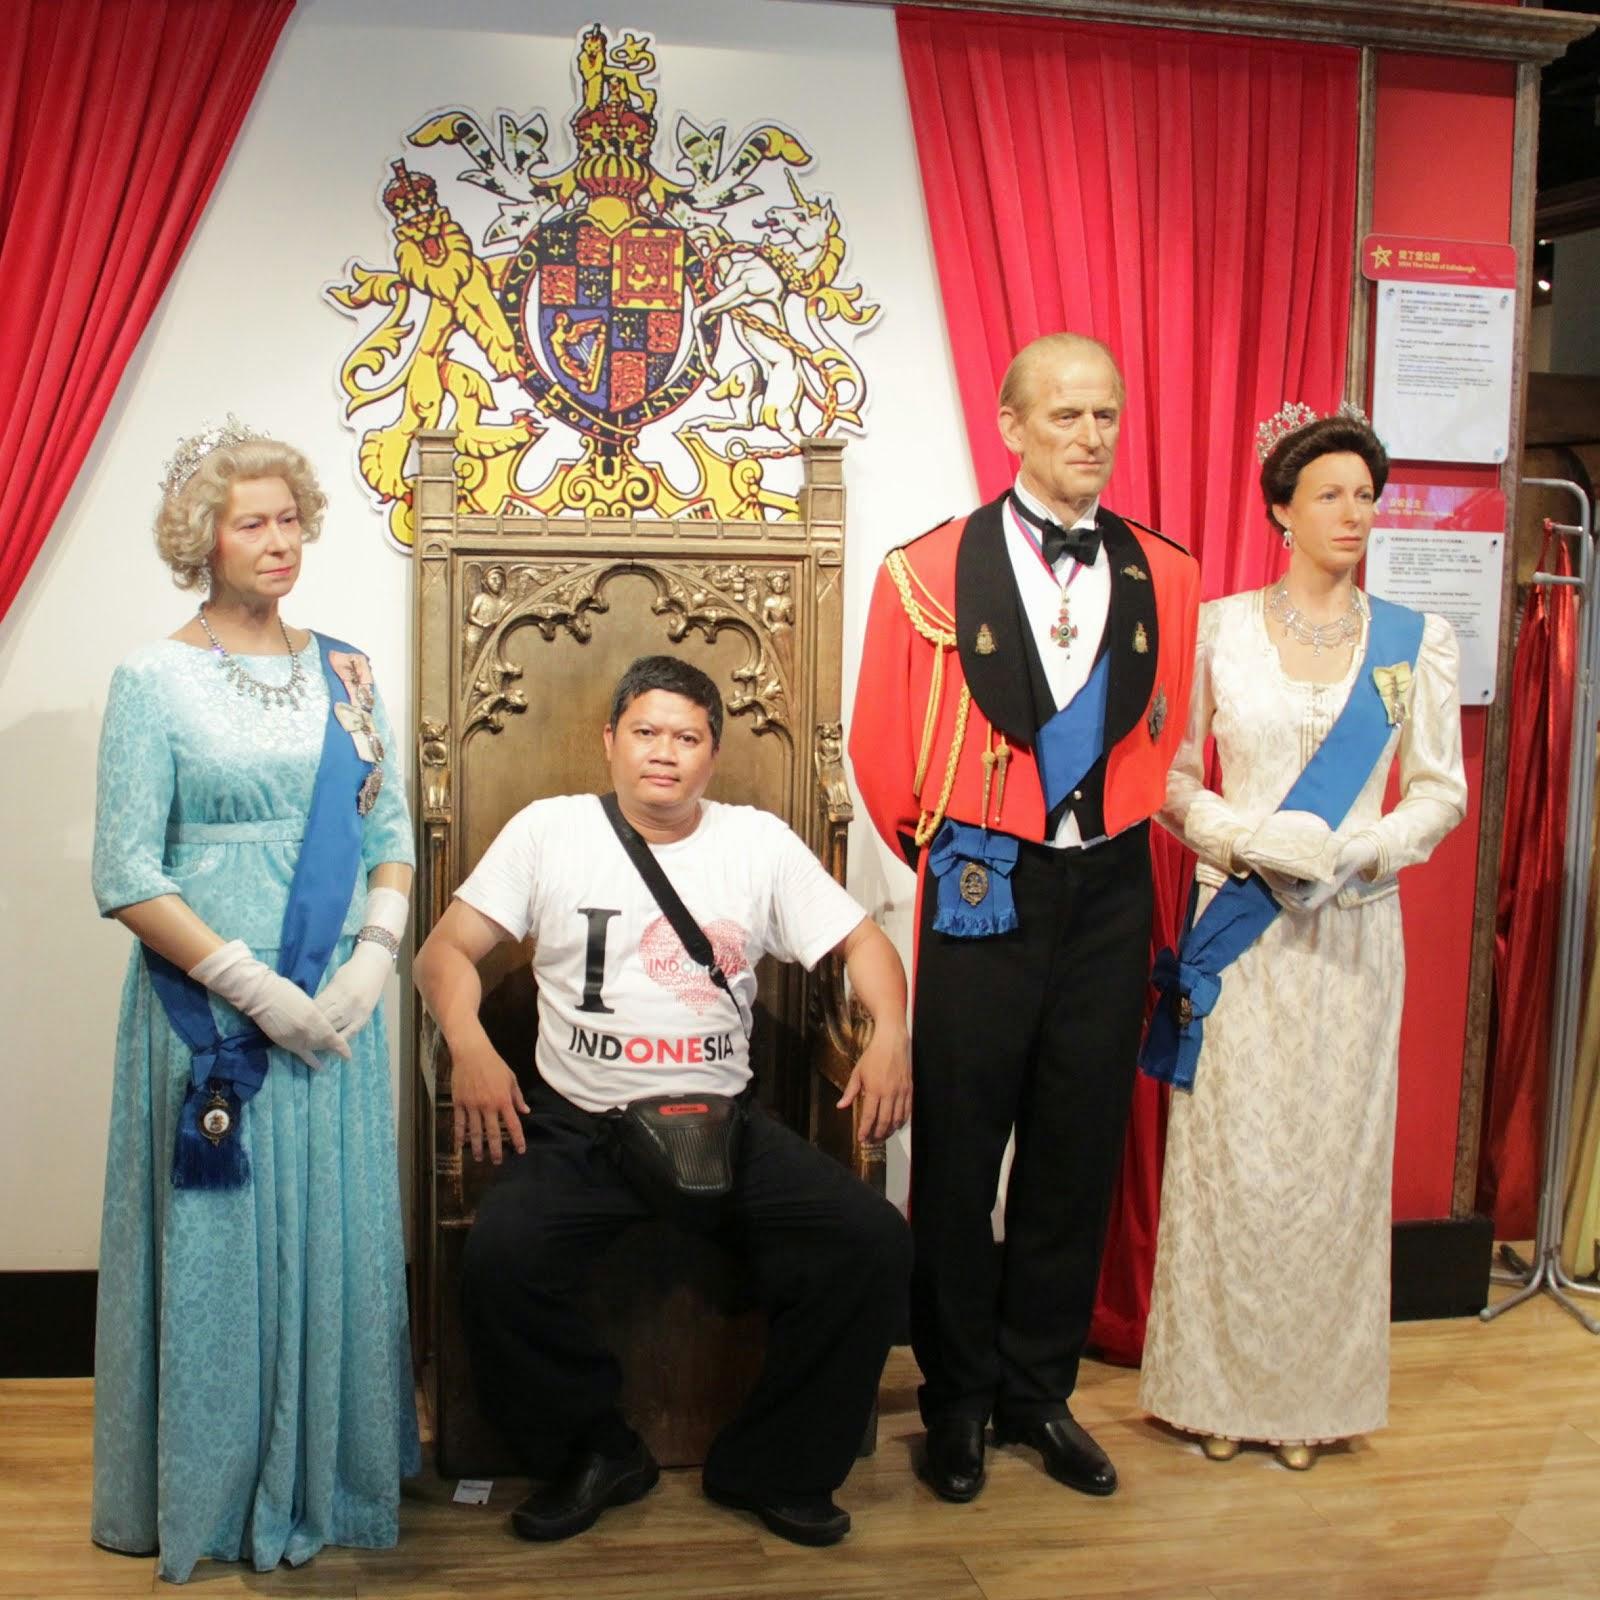 Bersama Keluarag Kerajaan Inggris